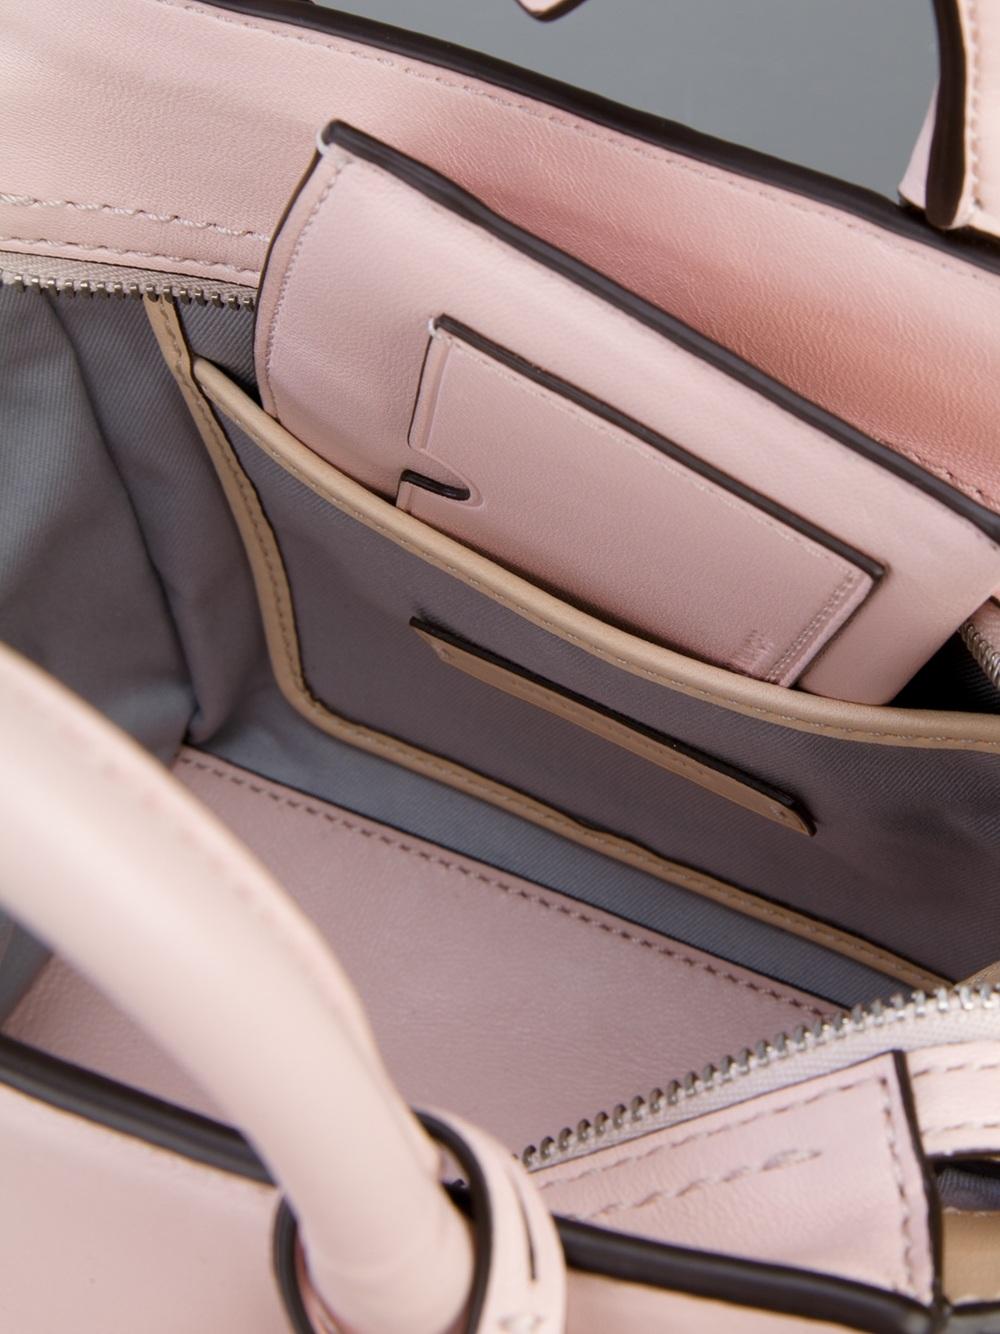 Reed Krakoff Mini Atlantique Tote in Pink